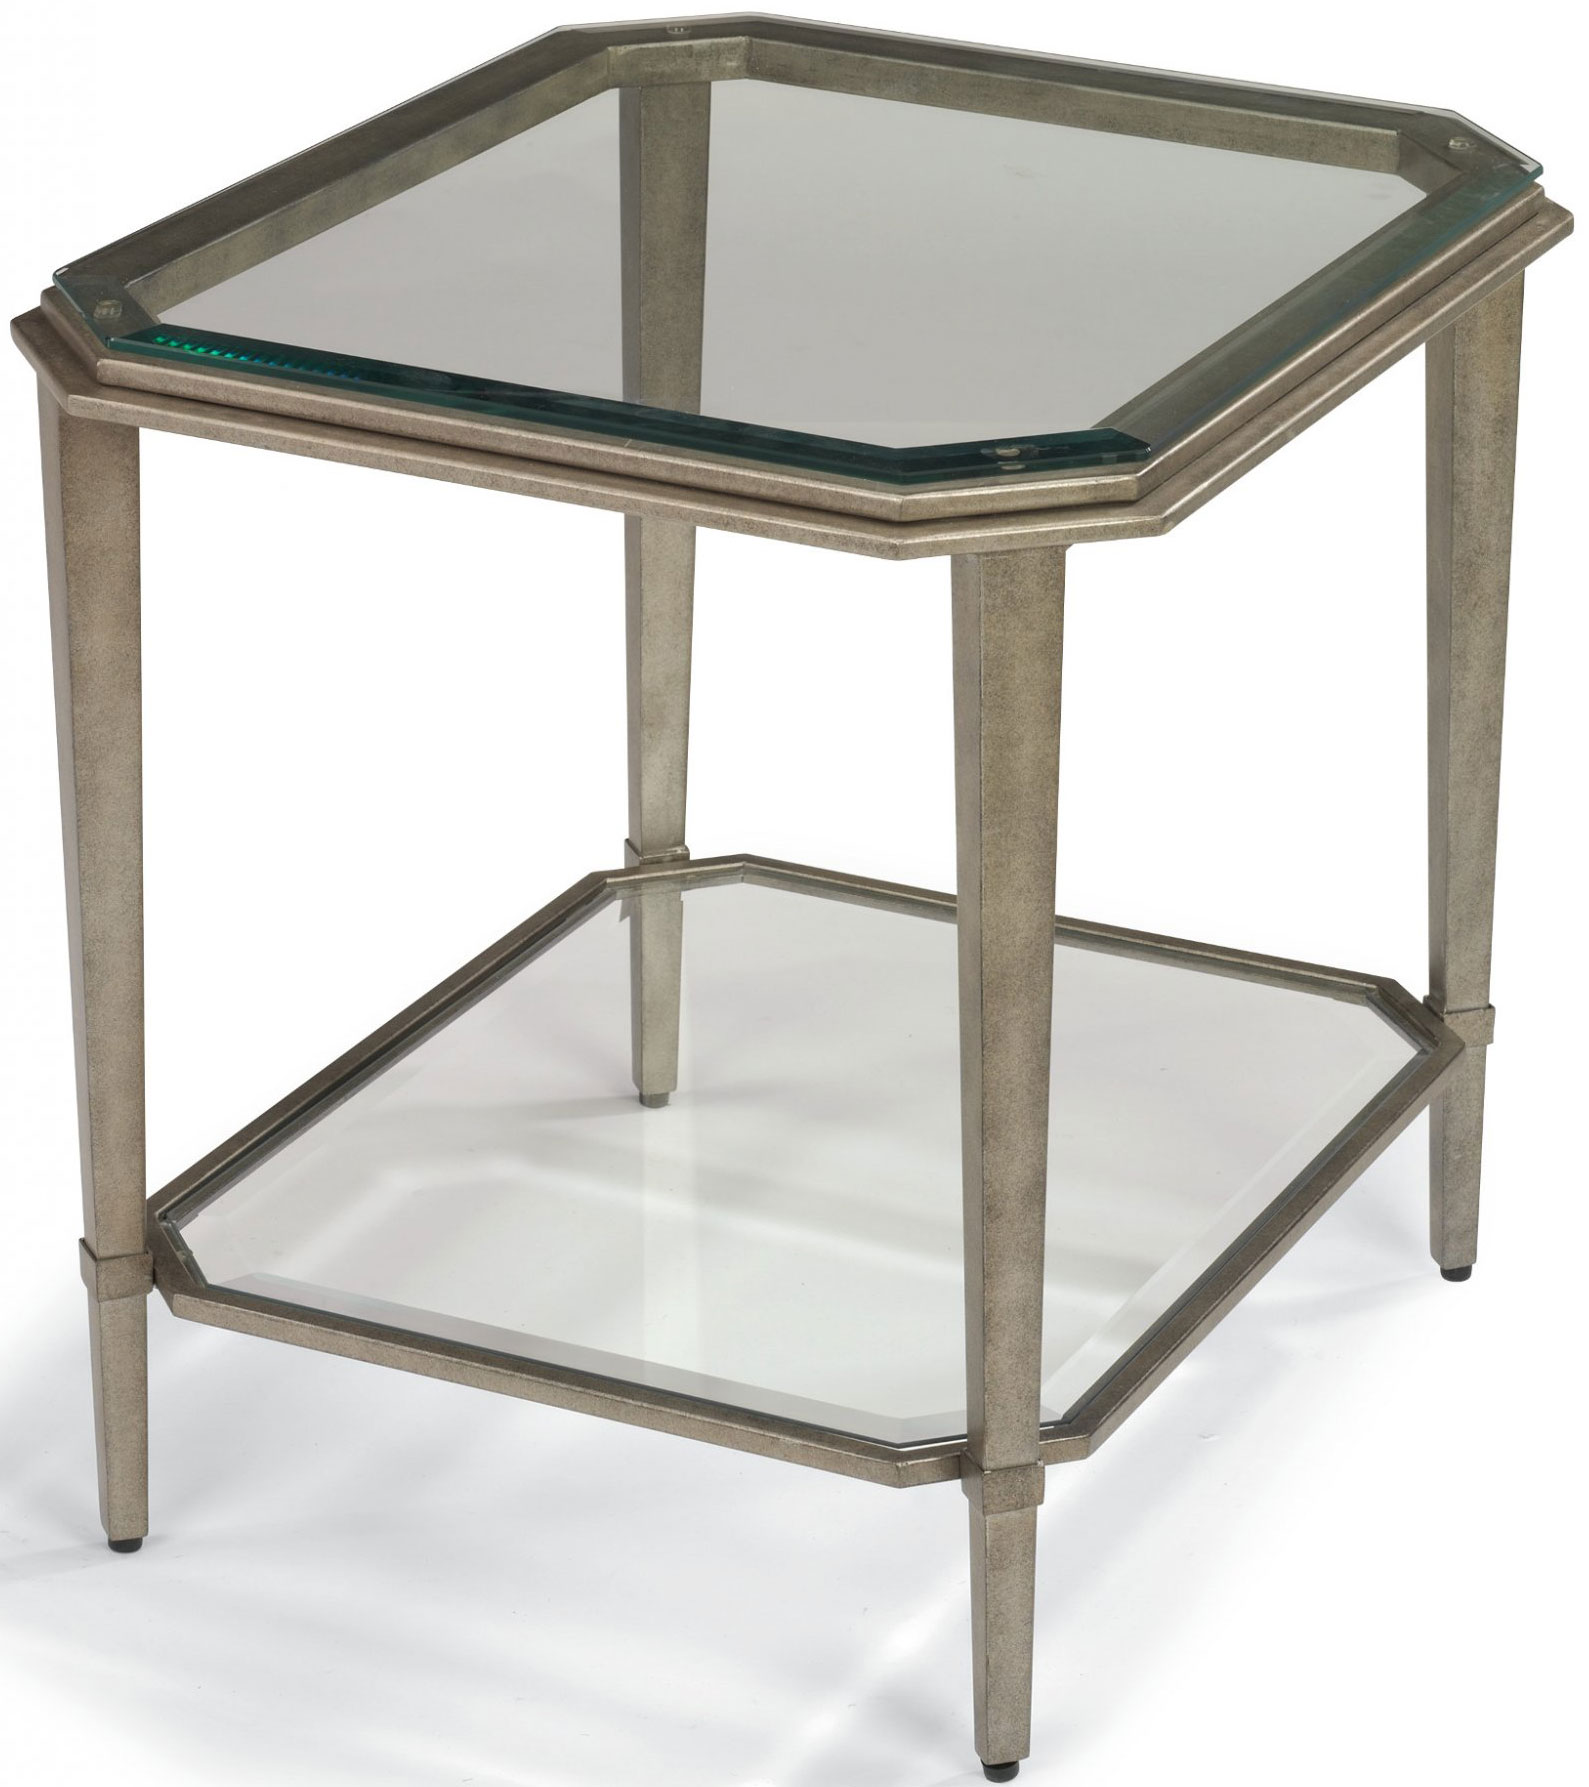 Flexsteel Prism End Table 6693 01